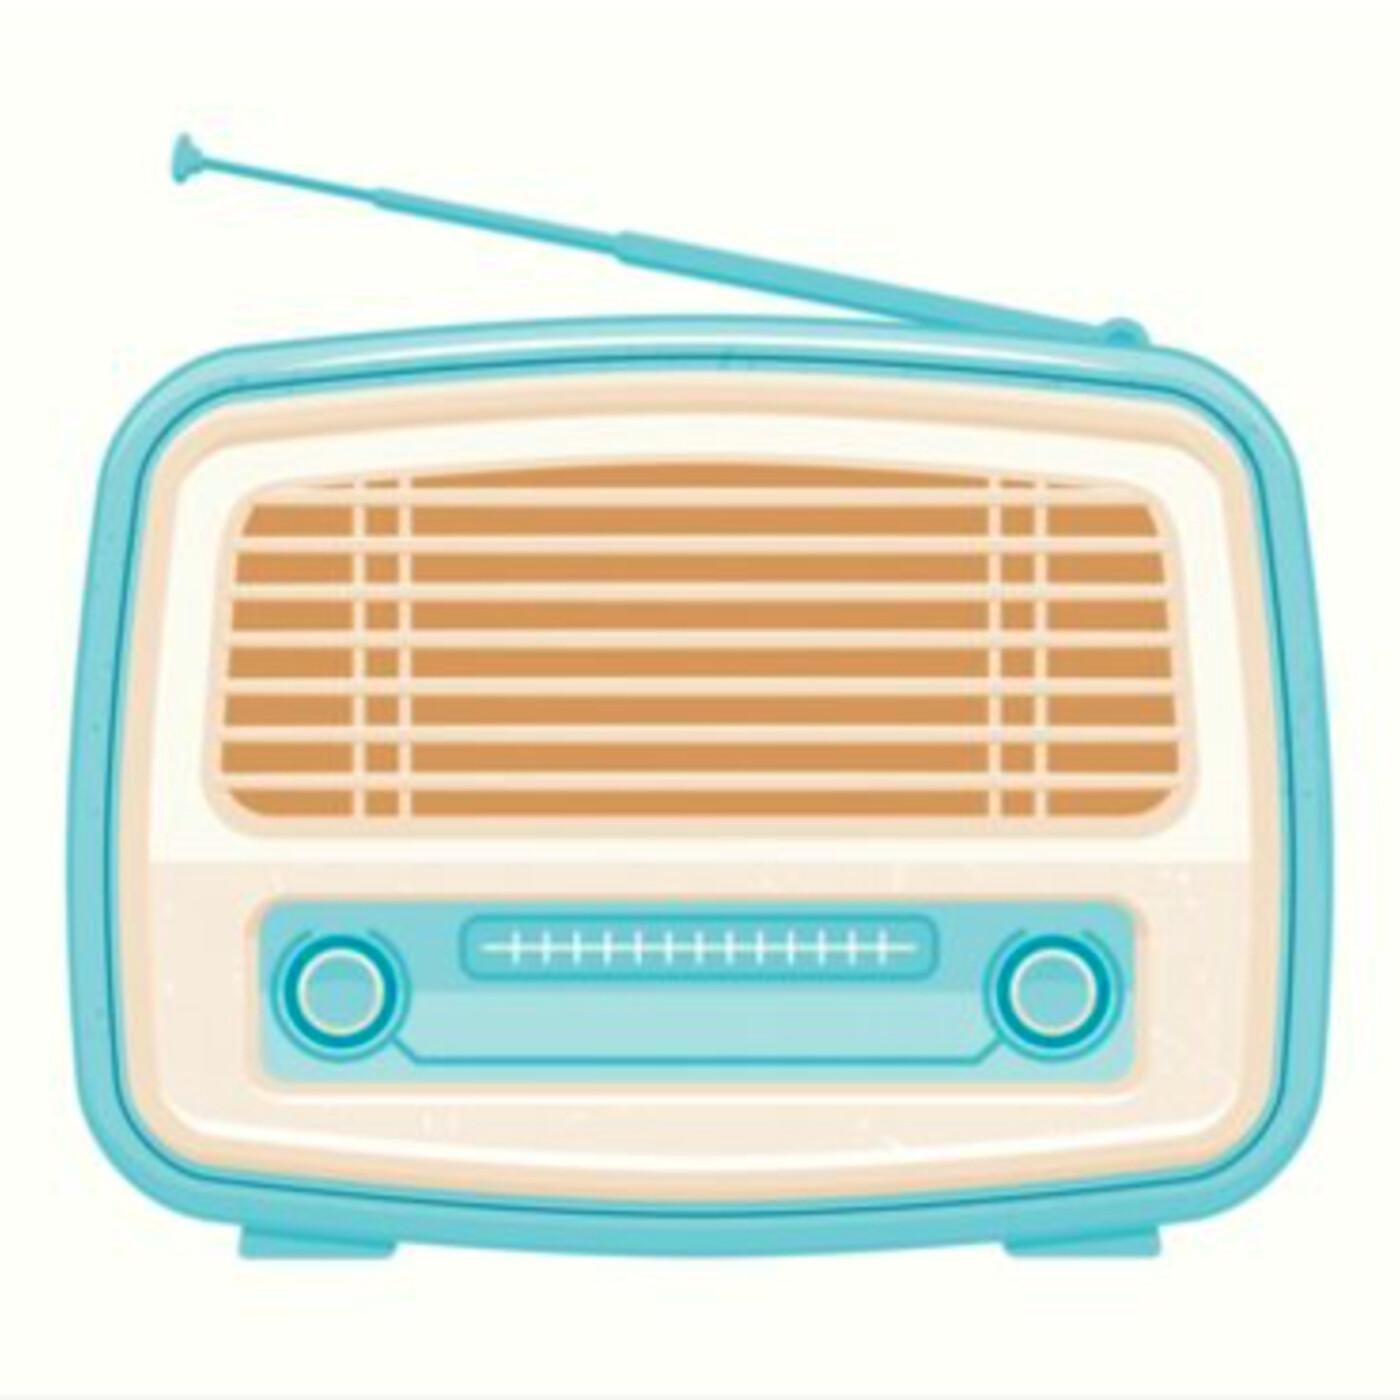 A mala radio.